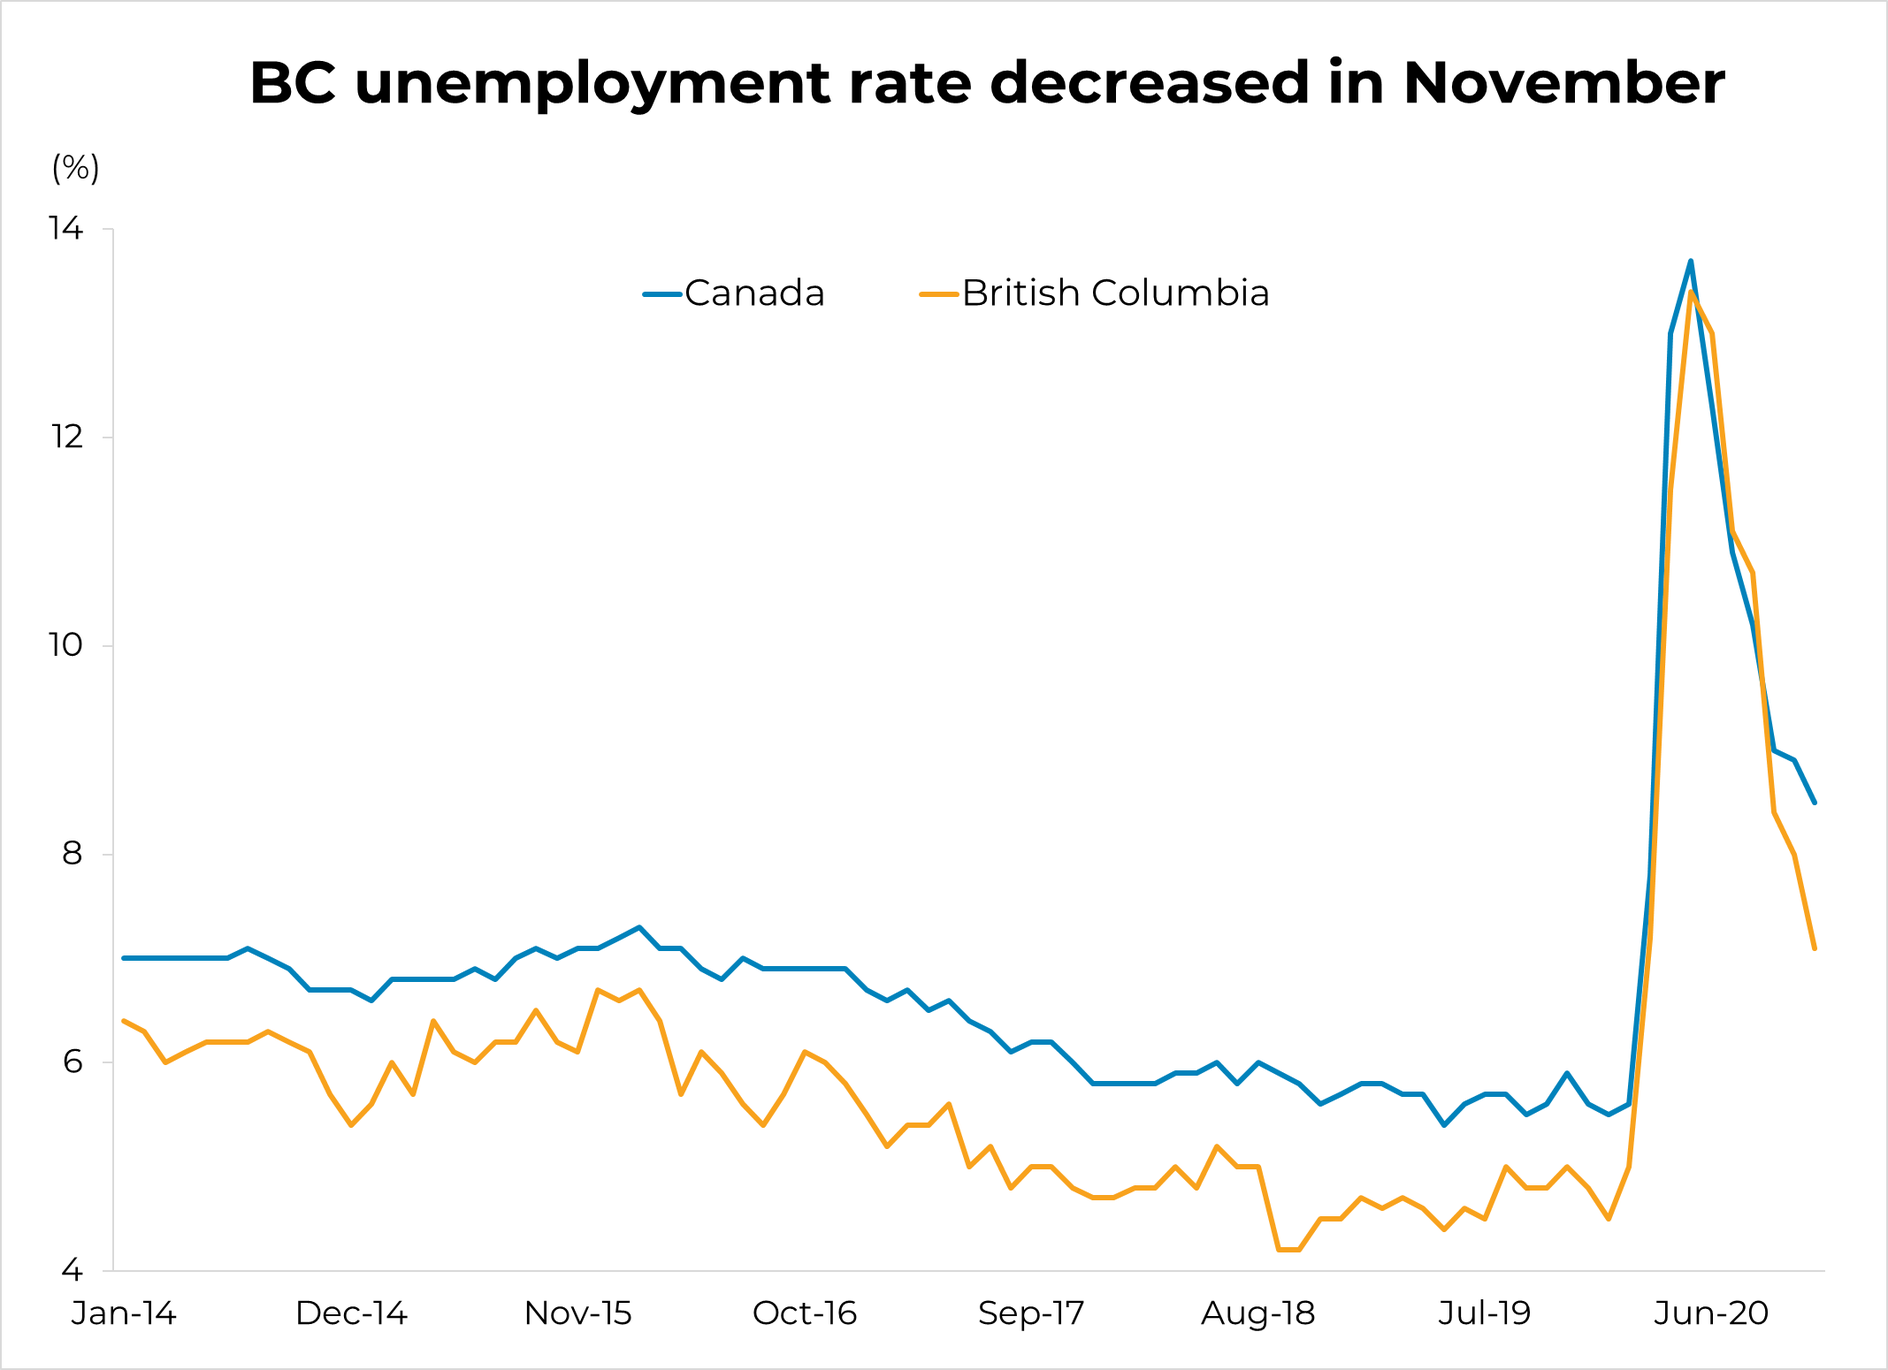 BC Unemployment - November 2020